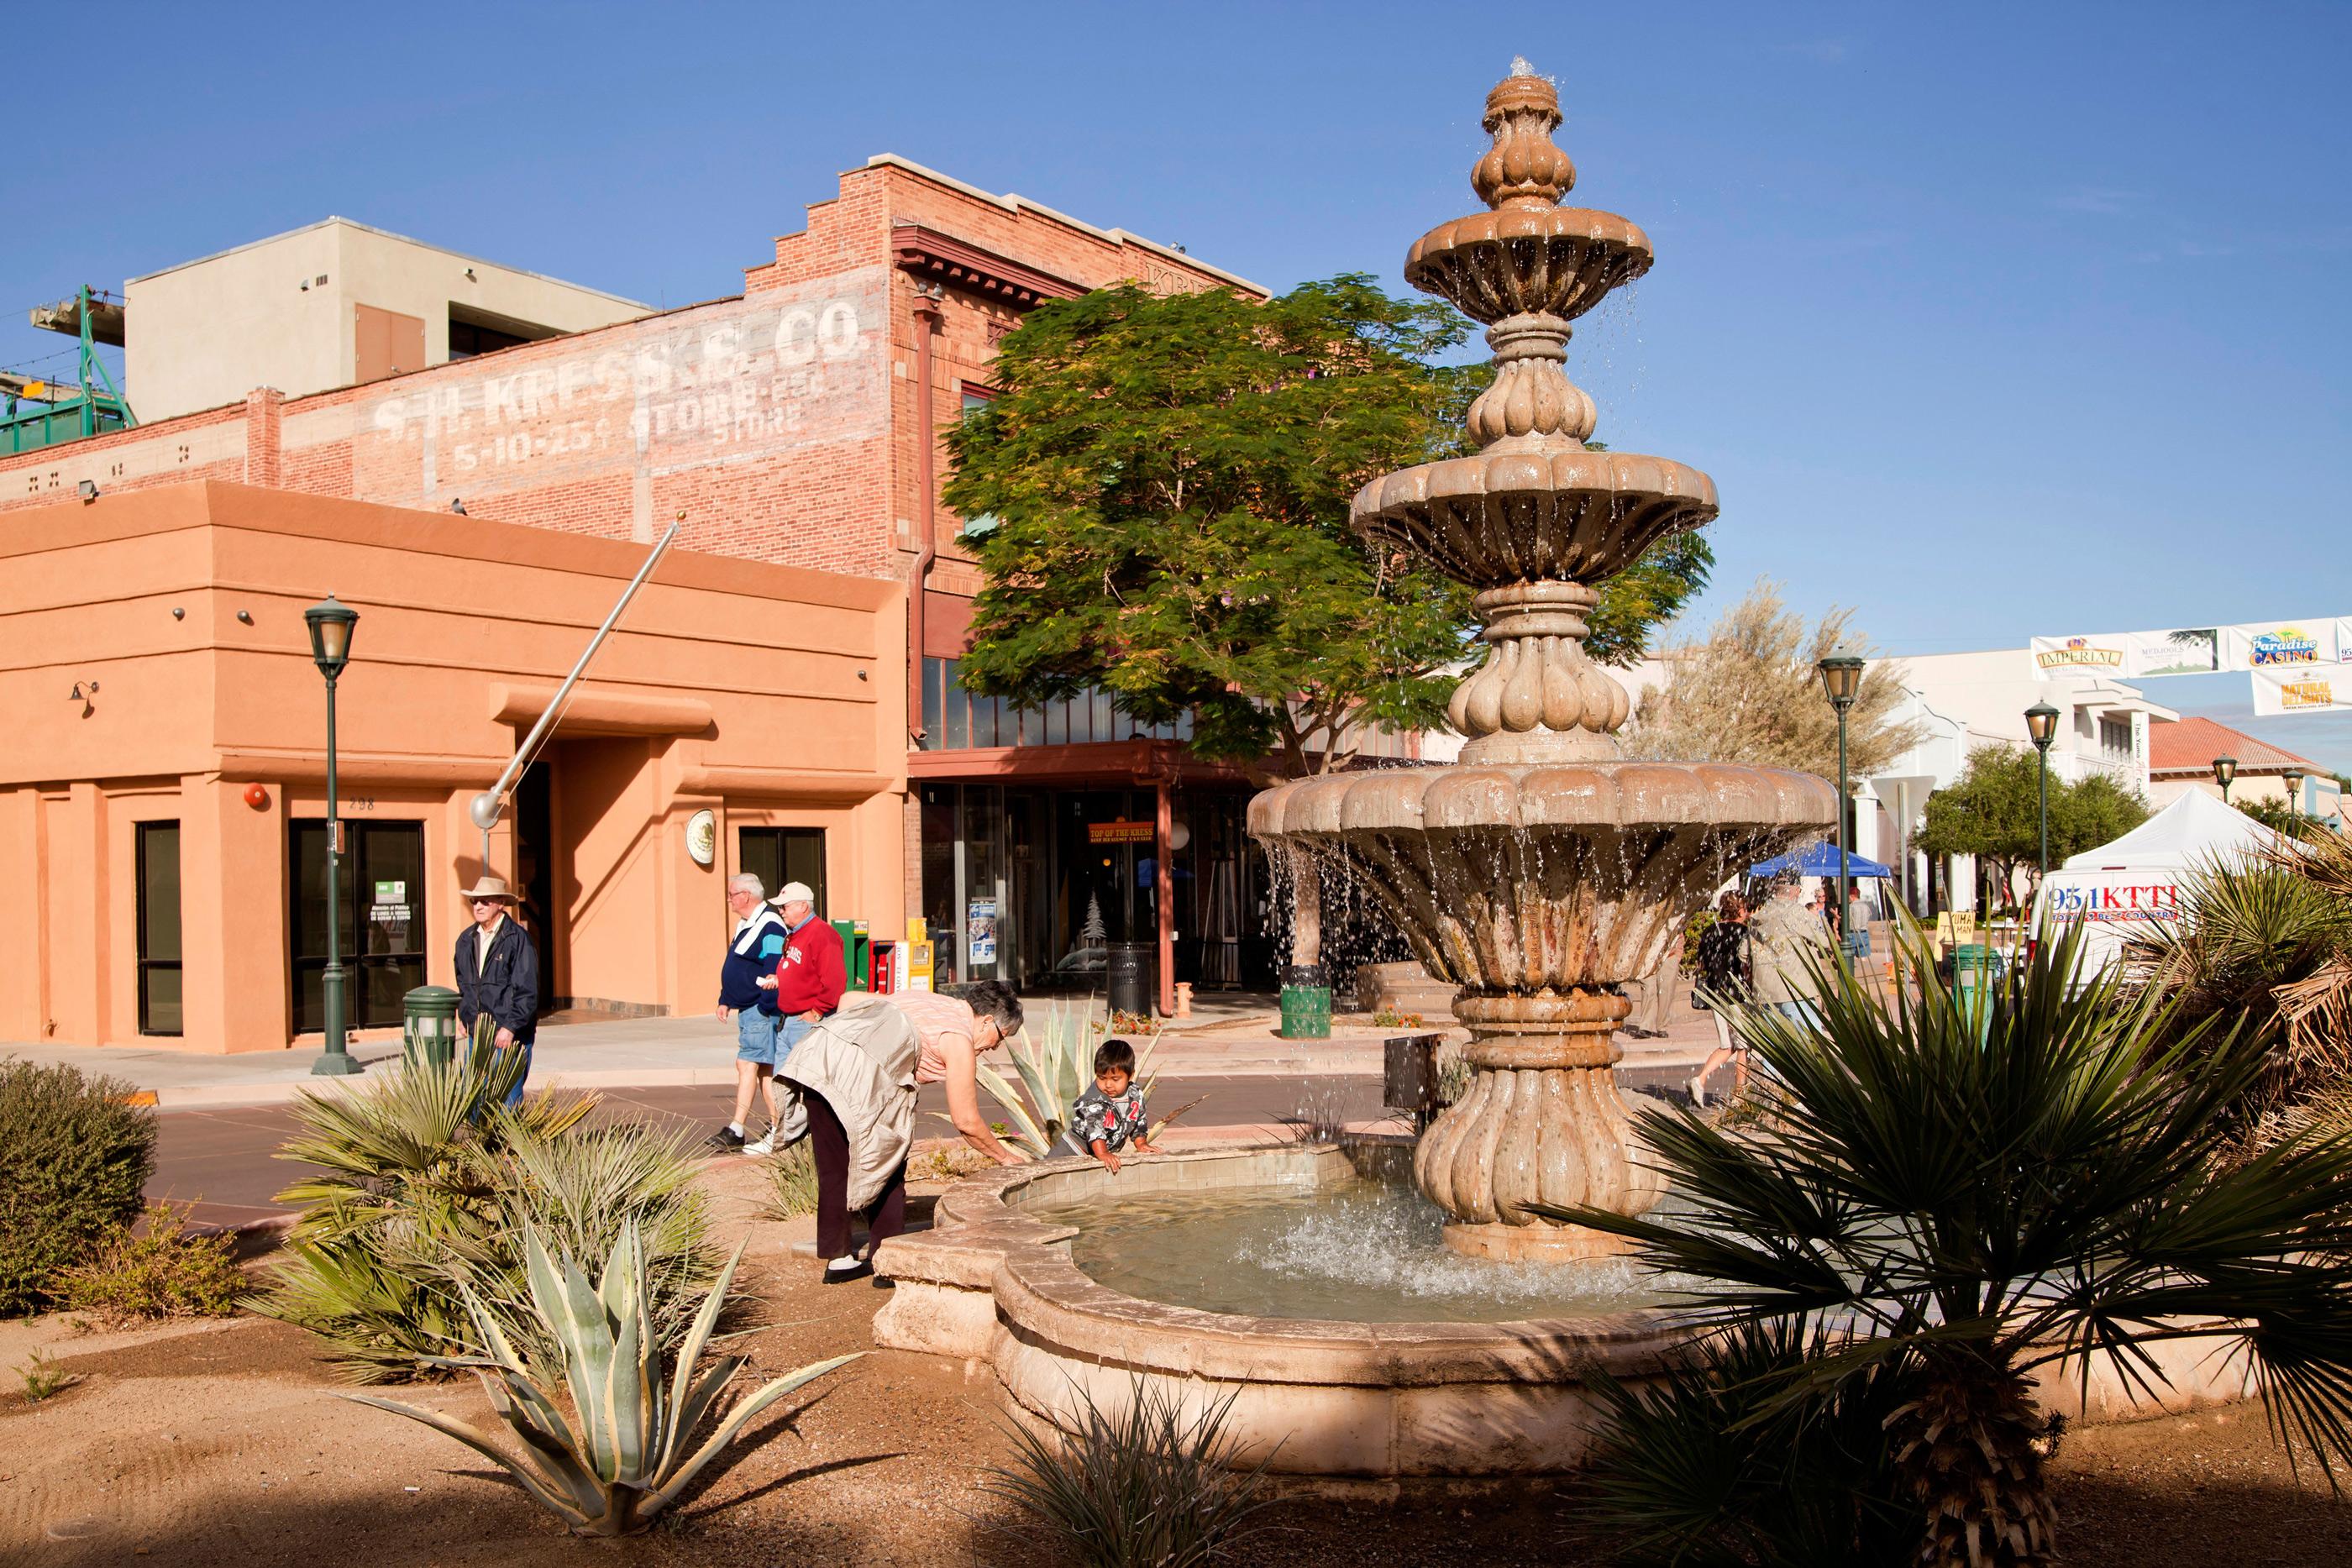 fountain at downtown Yuma, Arizona